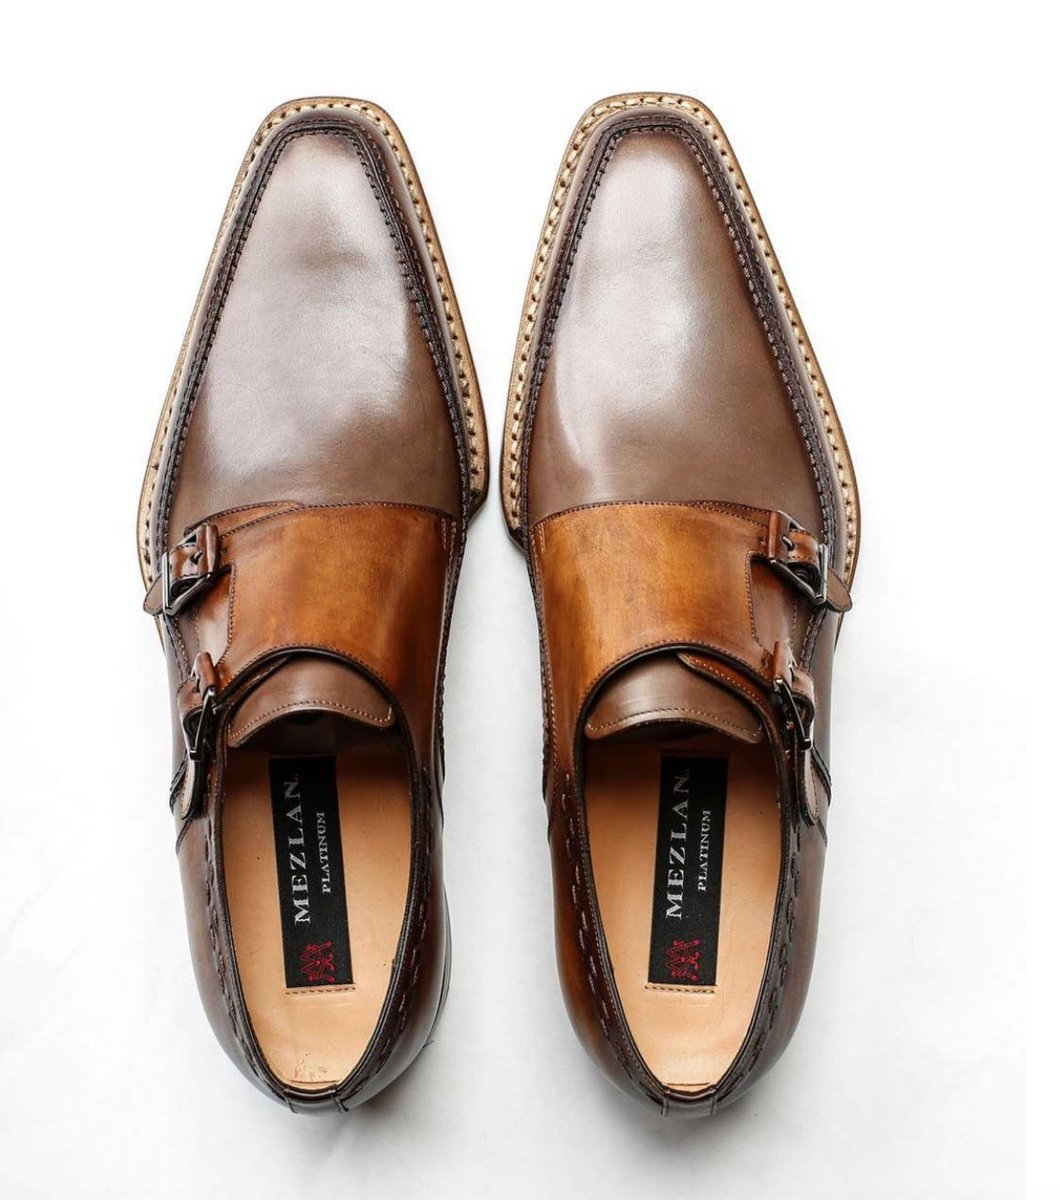 c9299b909b Mezlan Shoes on Twitter